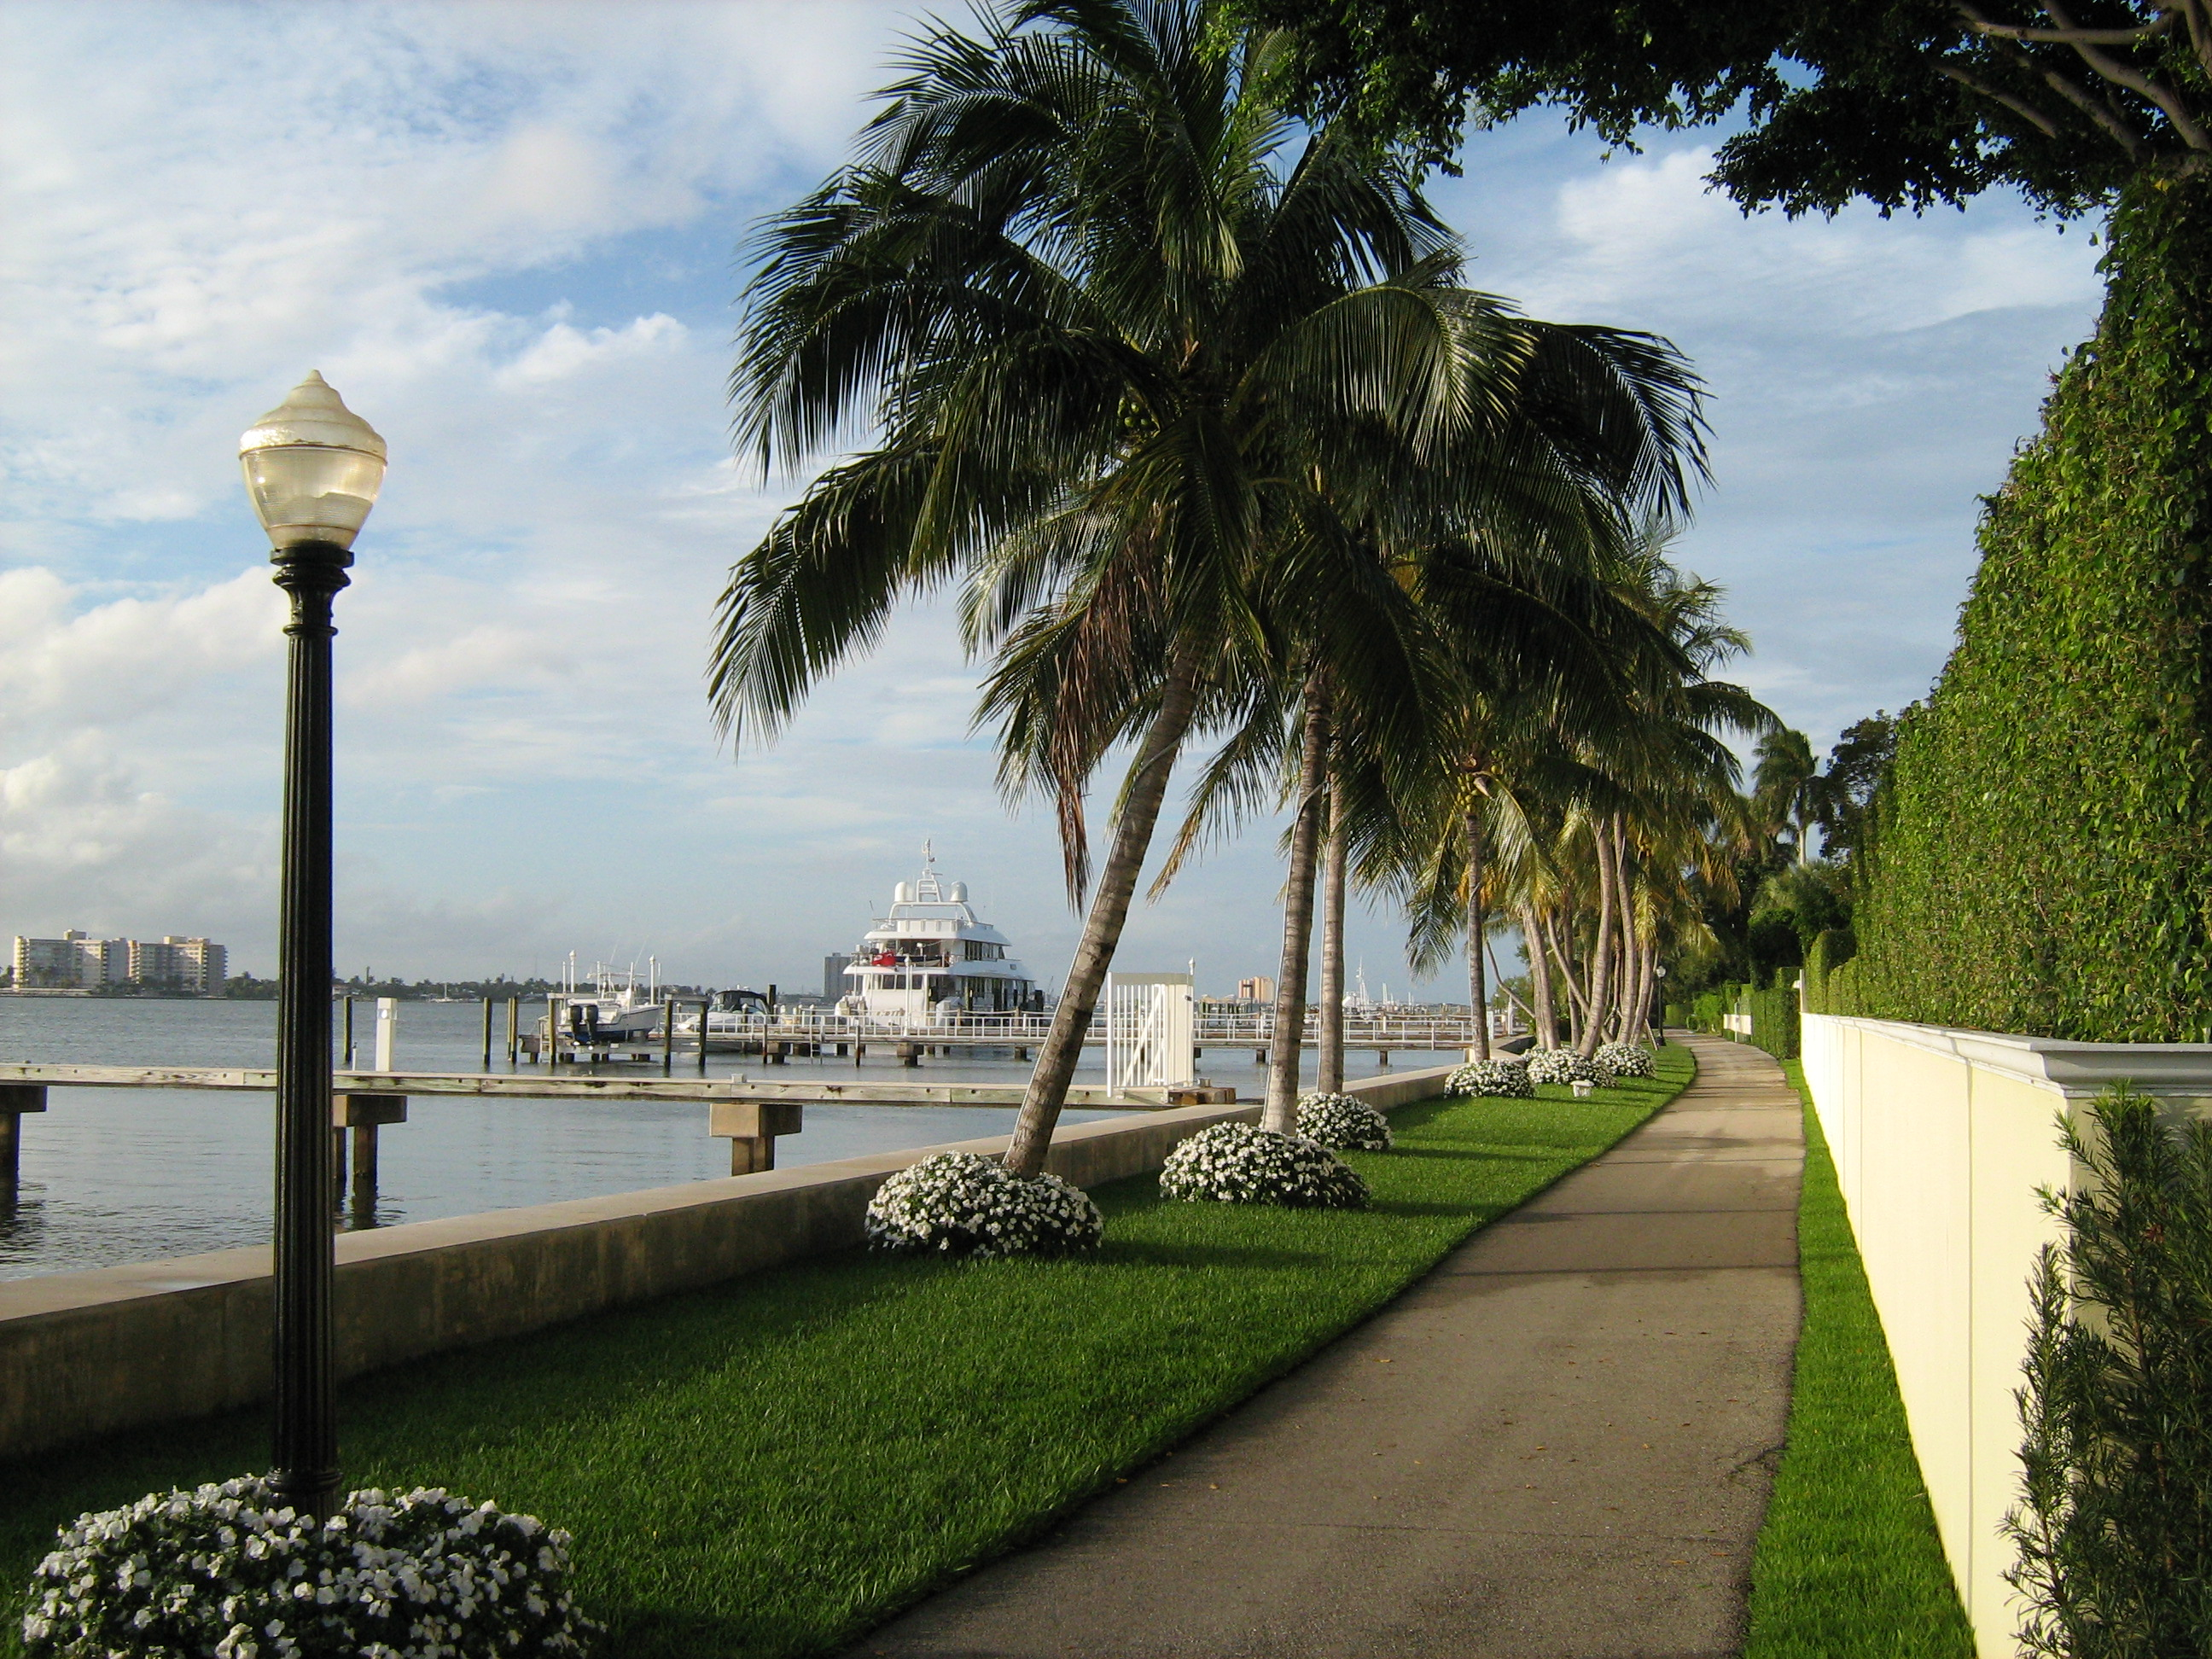 Hilton Palm Bea...